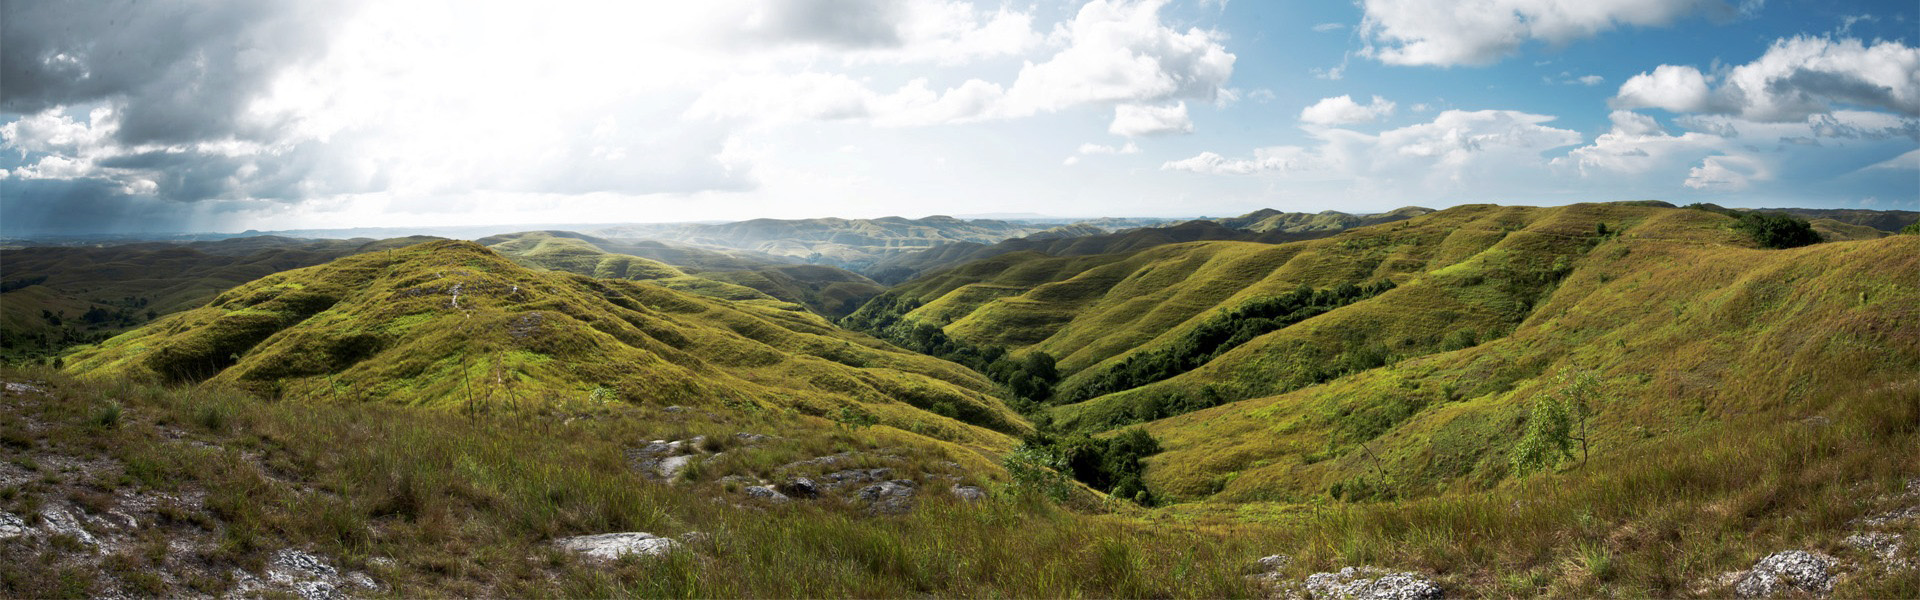 Wairinding Hills, East Sumba hinterland